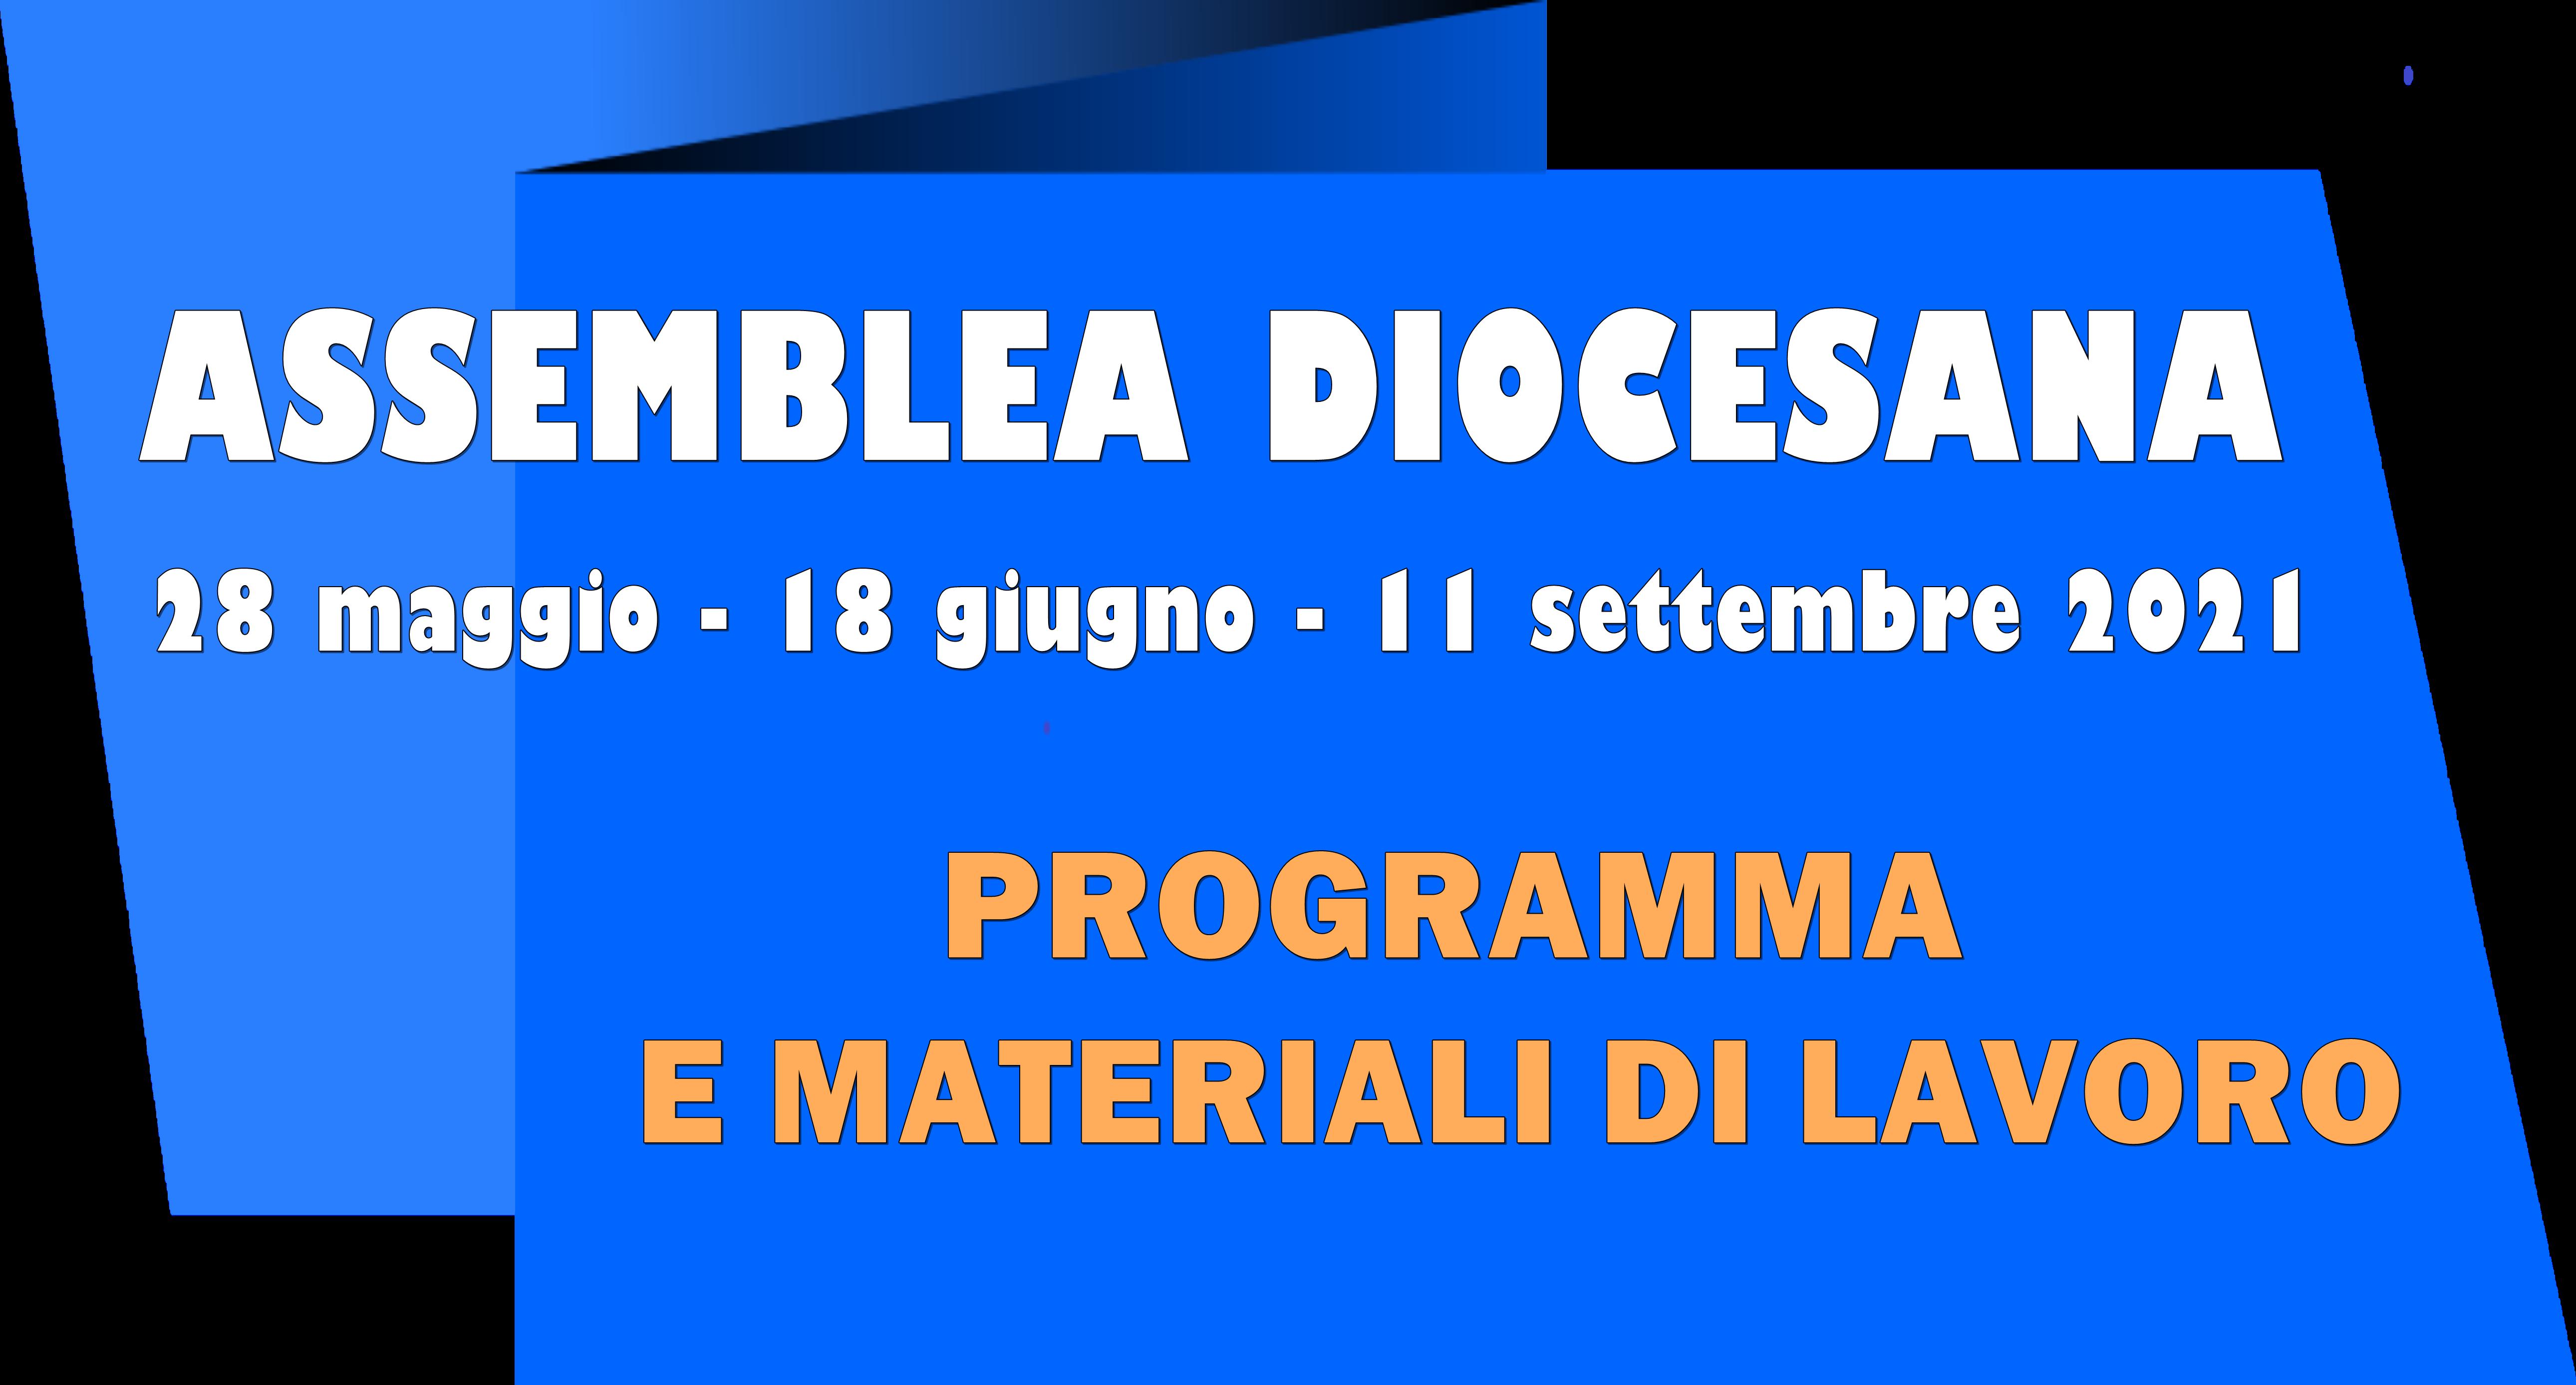 Assemblea diocesana 2021 - programma e materiali